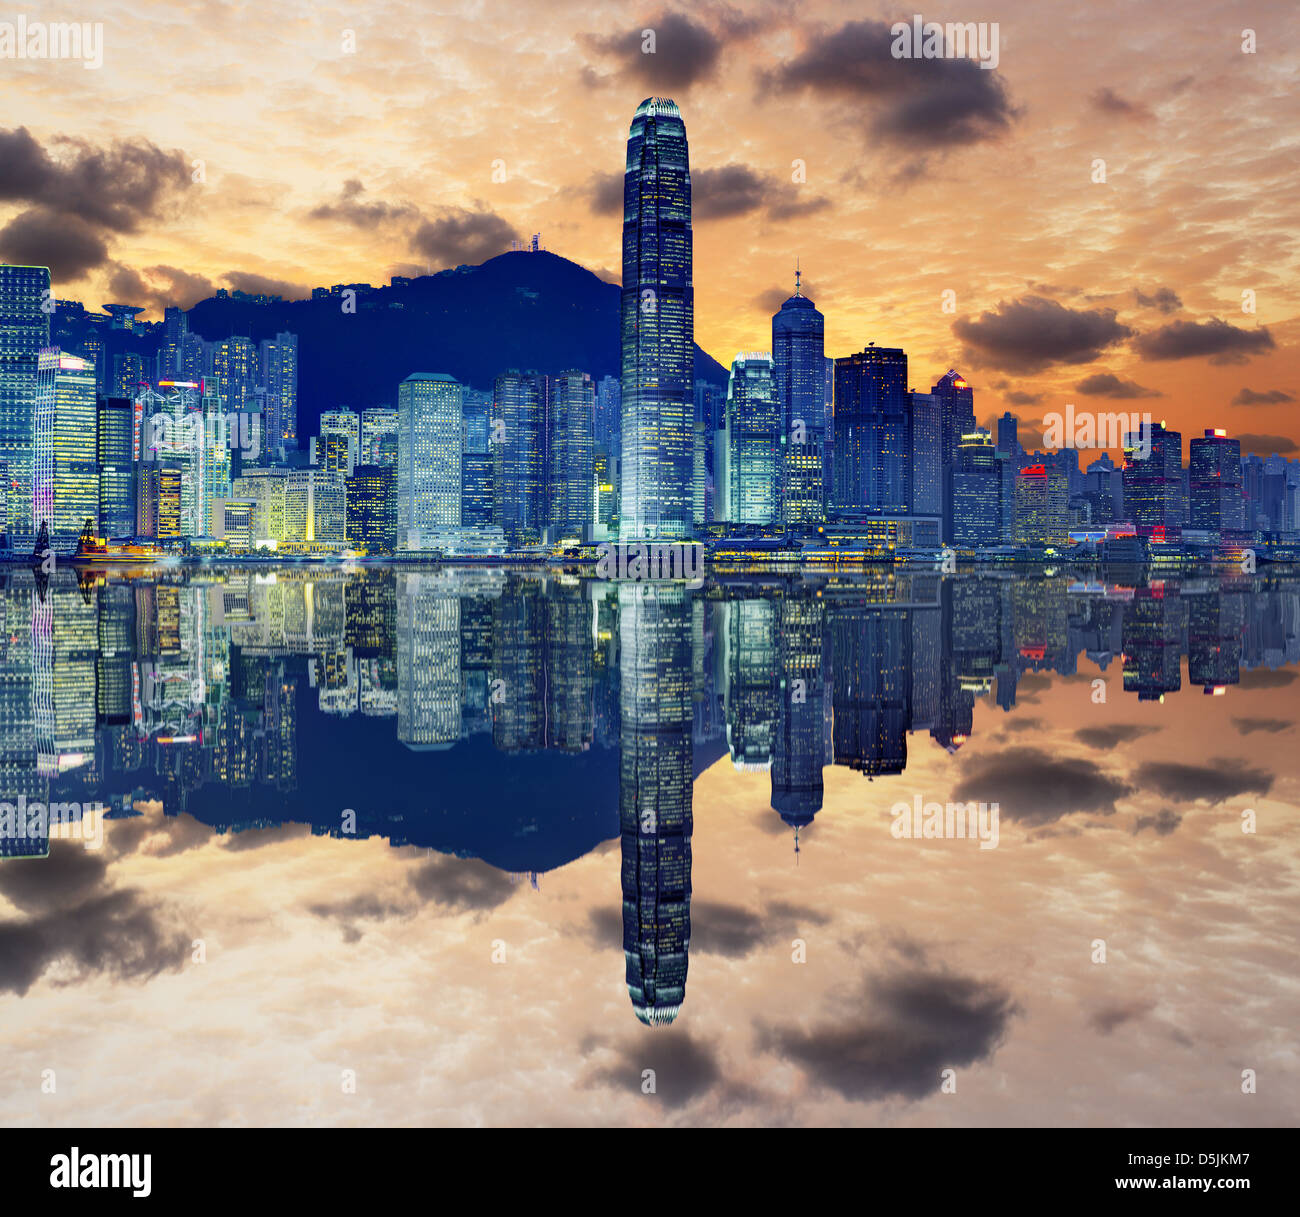 Skyline of Hong Kong Island. - Stock Image